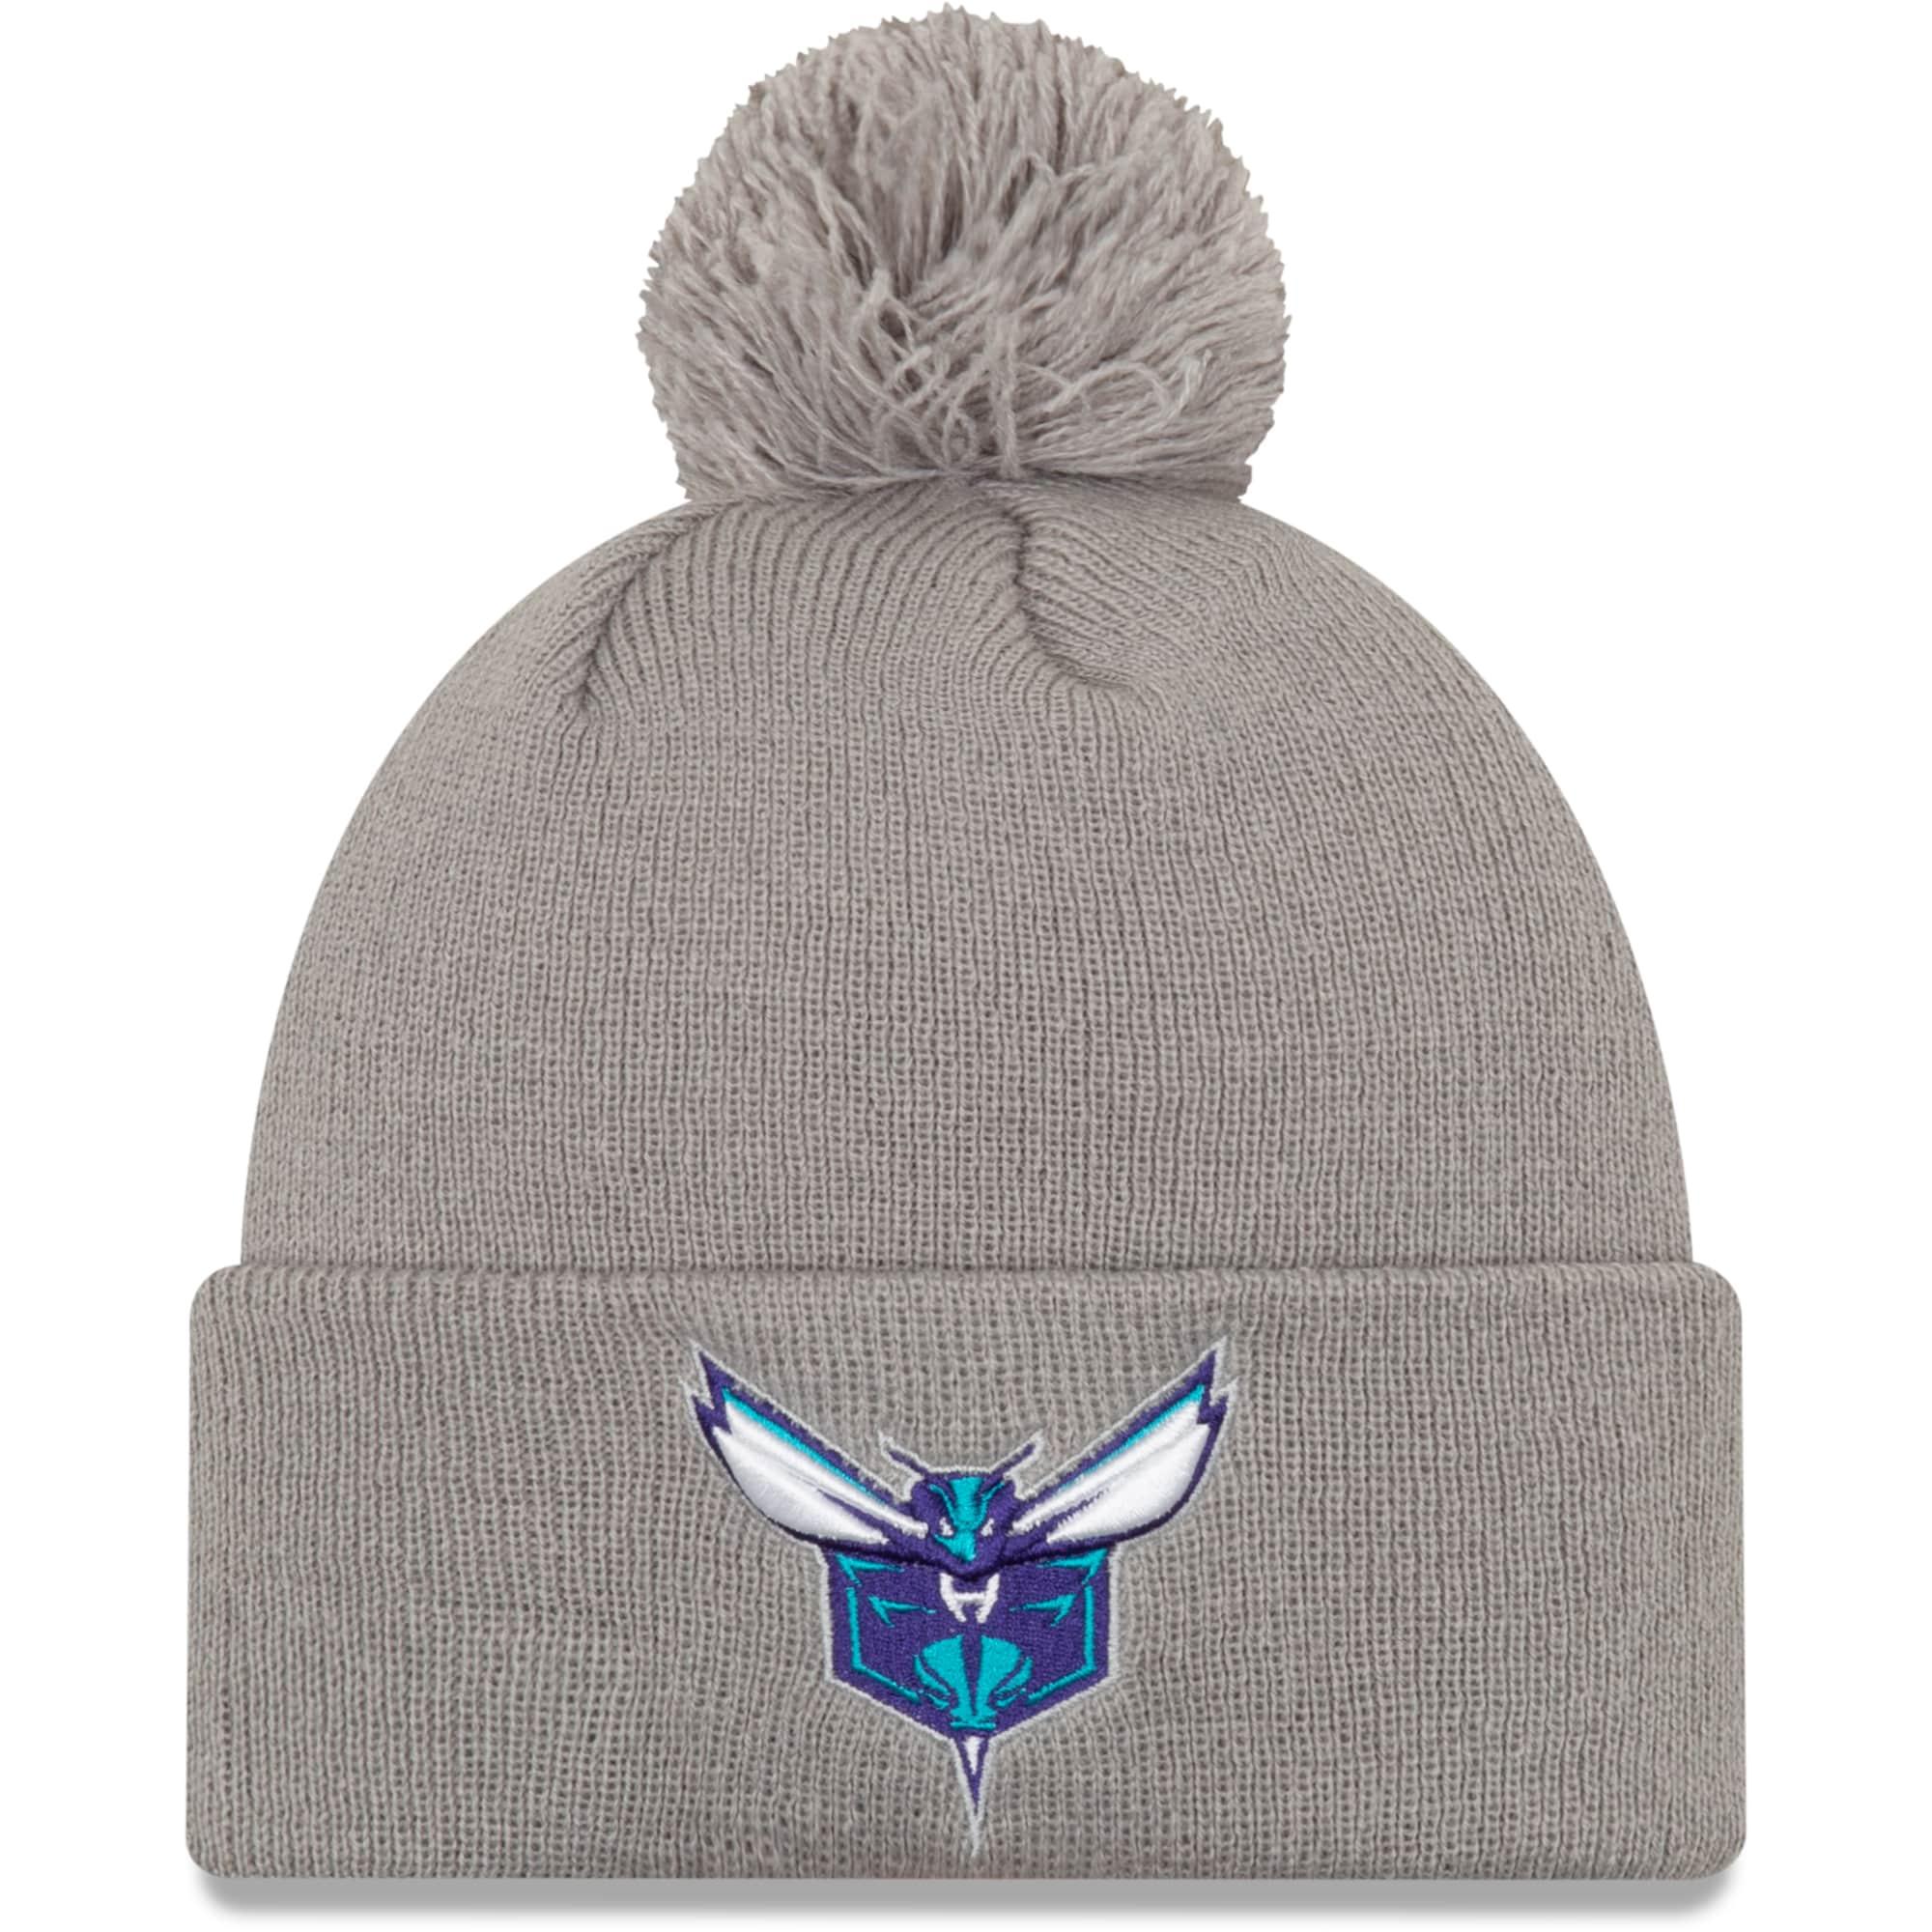 Charlotte Hornets New Era 2019/20 City Edition Pom Knit Hat - Gray